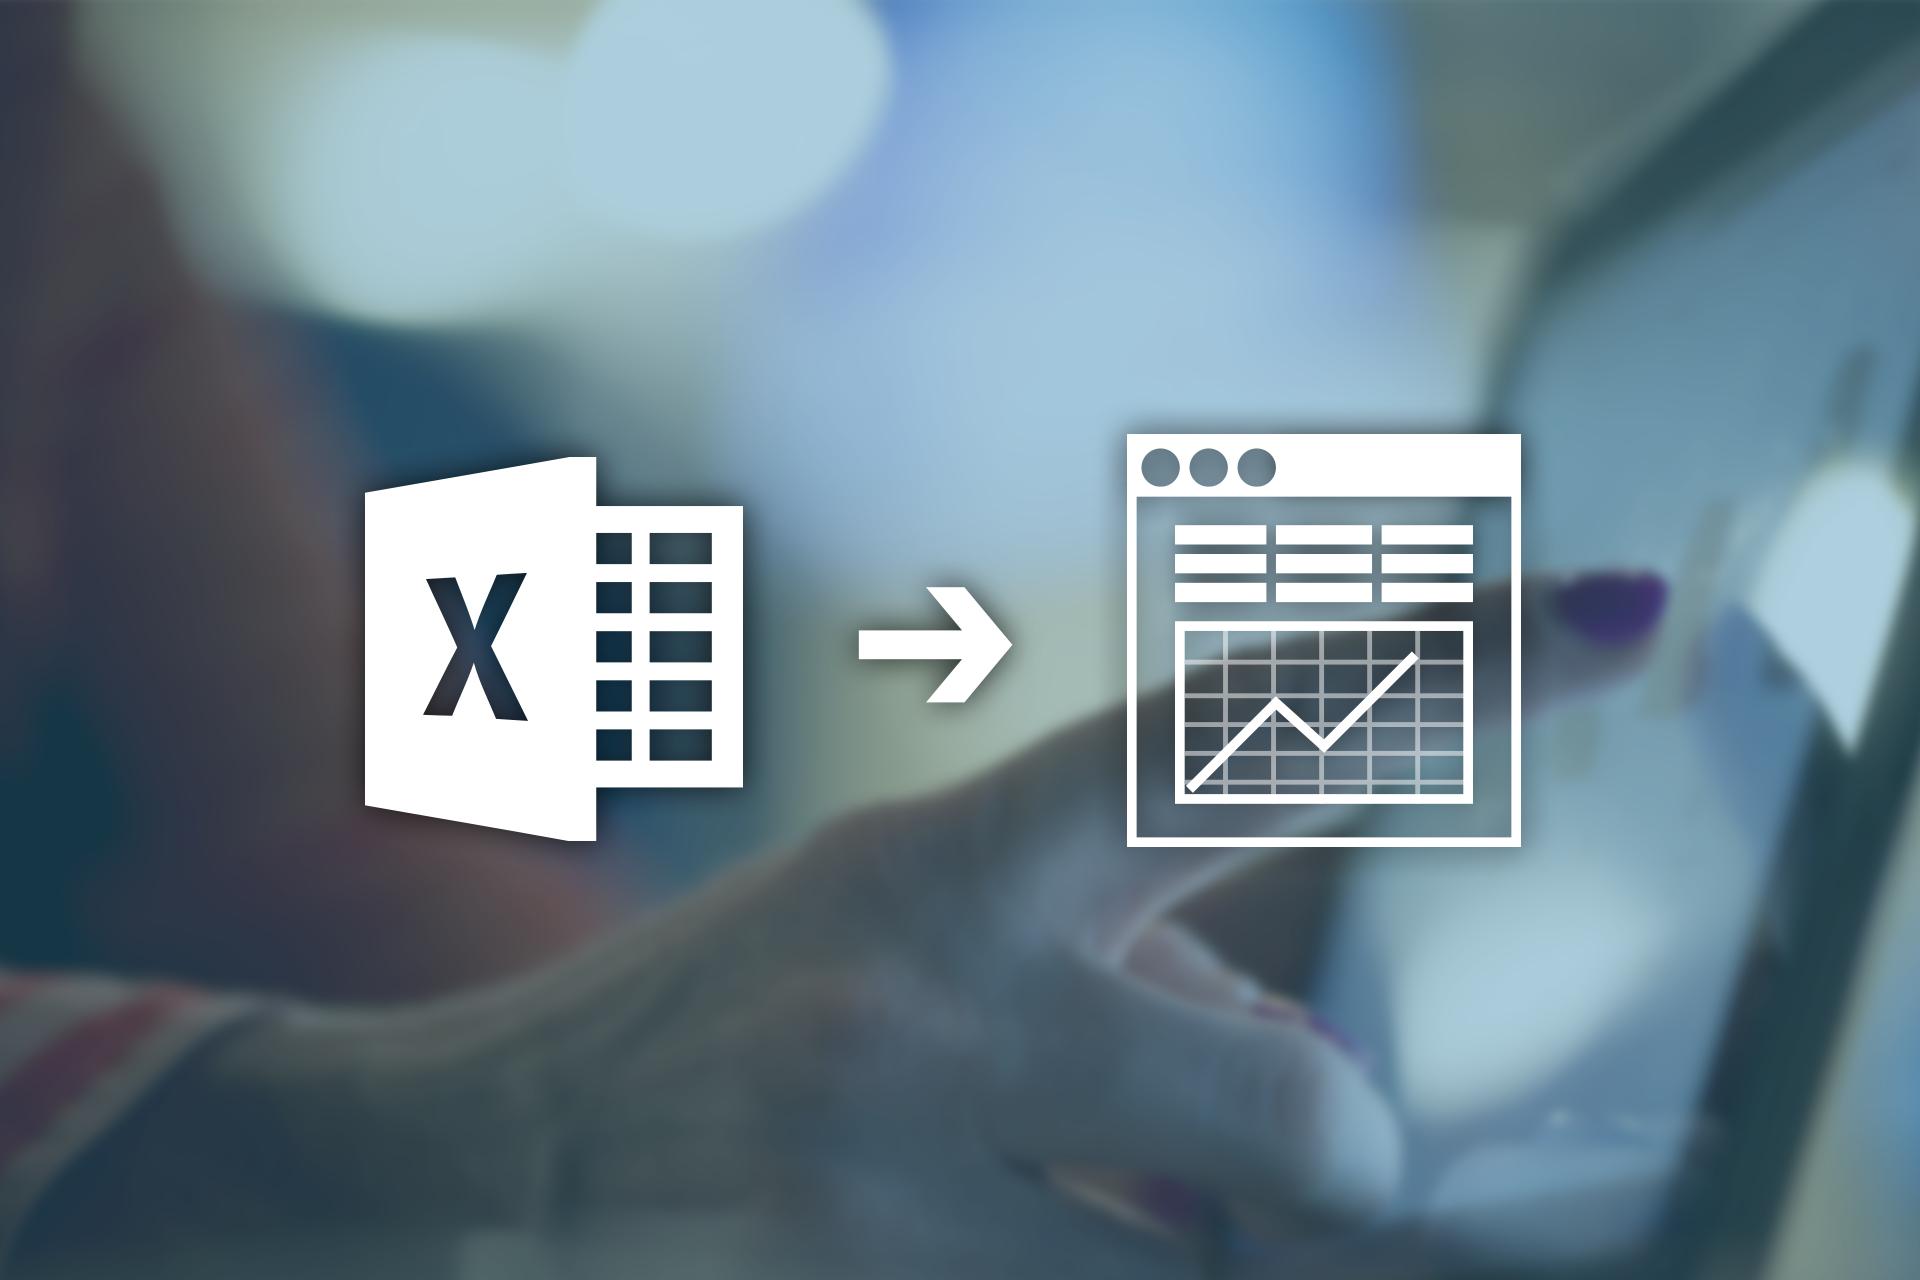 Convert Spreadsheet To Database With Regard To Convert Excel Spreadsheets Into Web Database Applications  Caspio